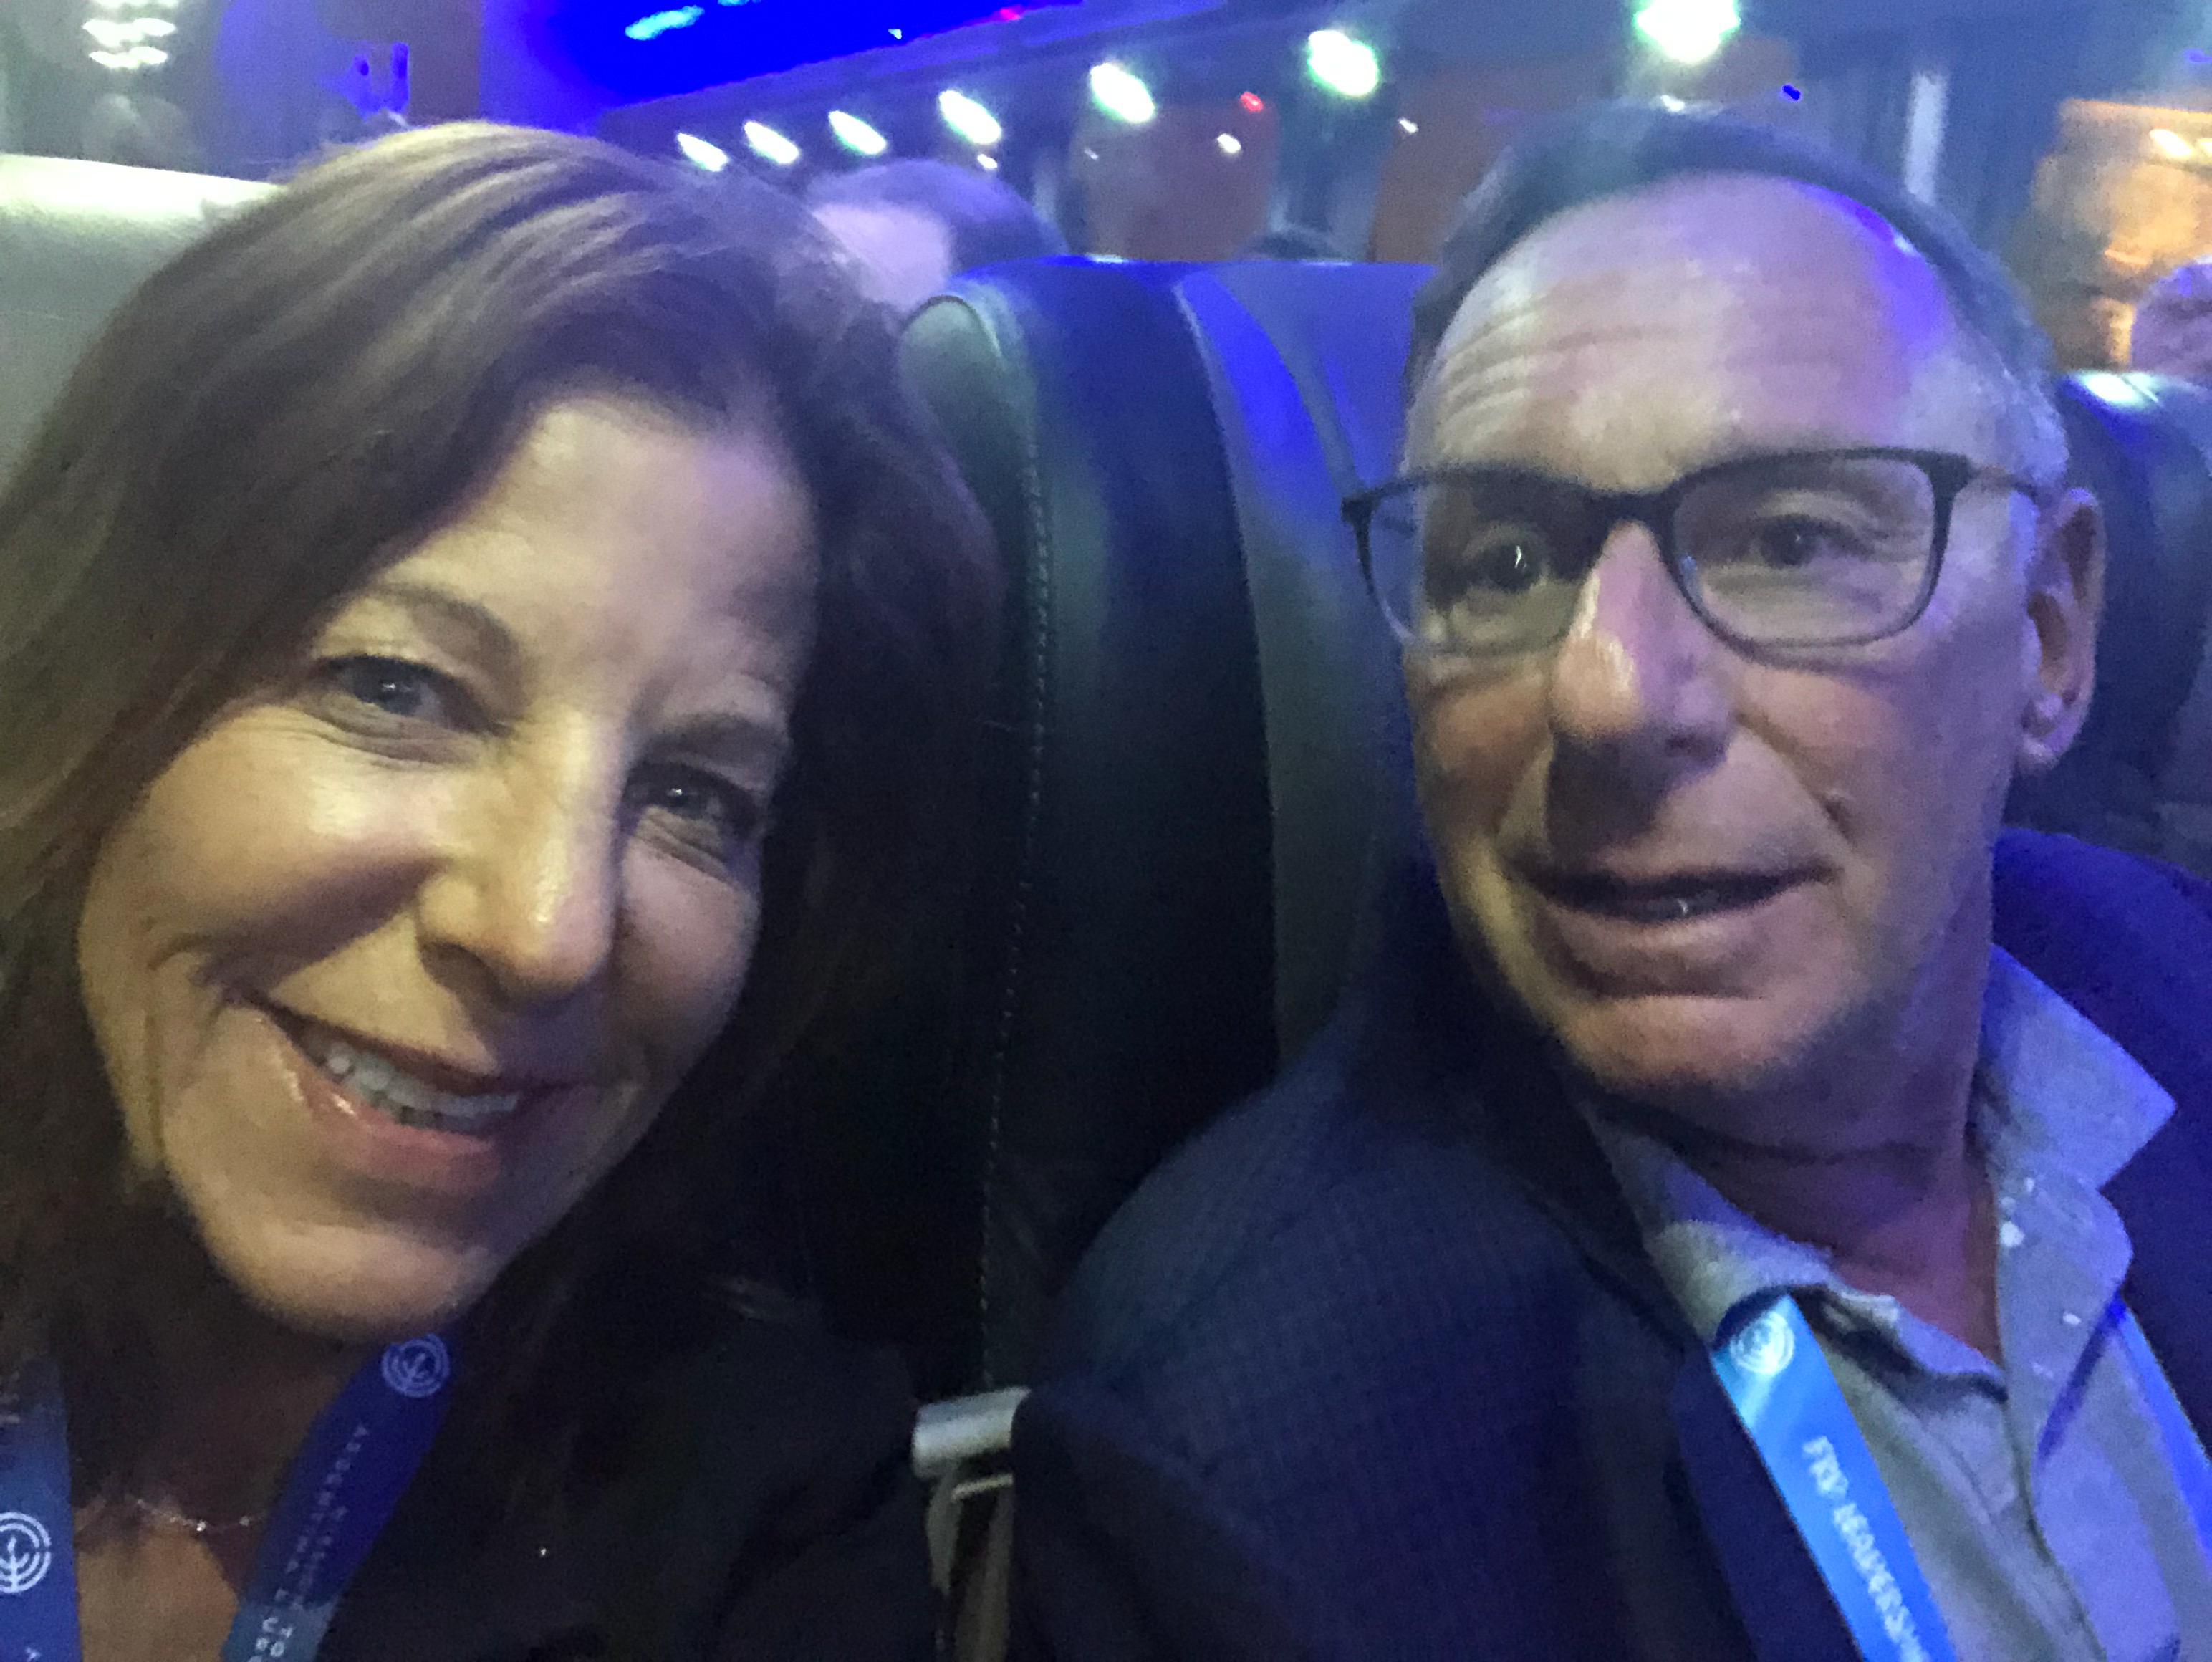 Wendy & Richard takeoff!